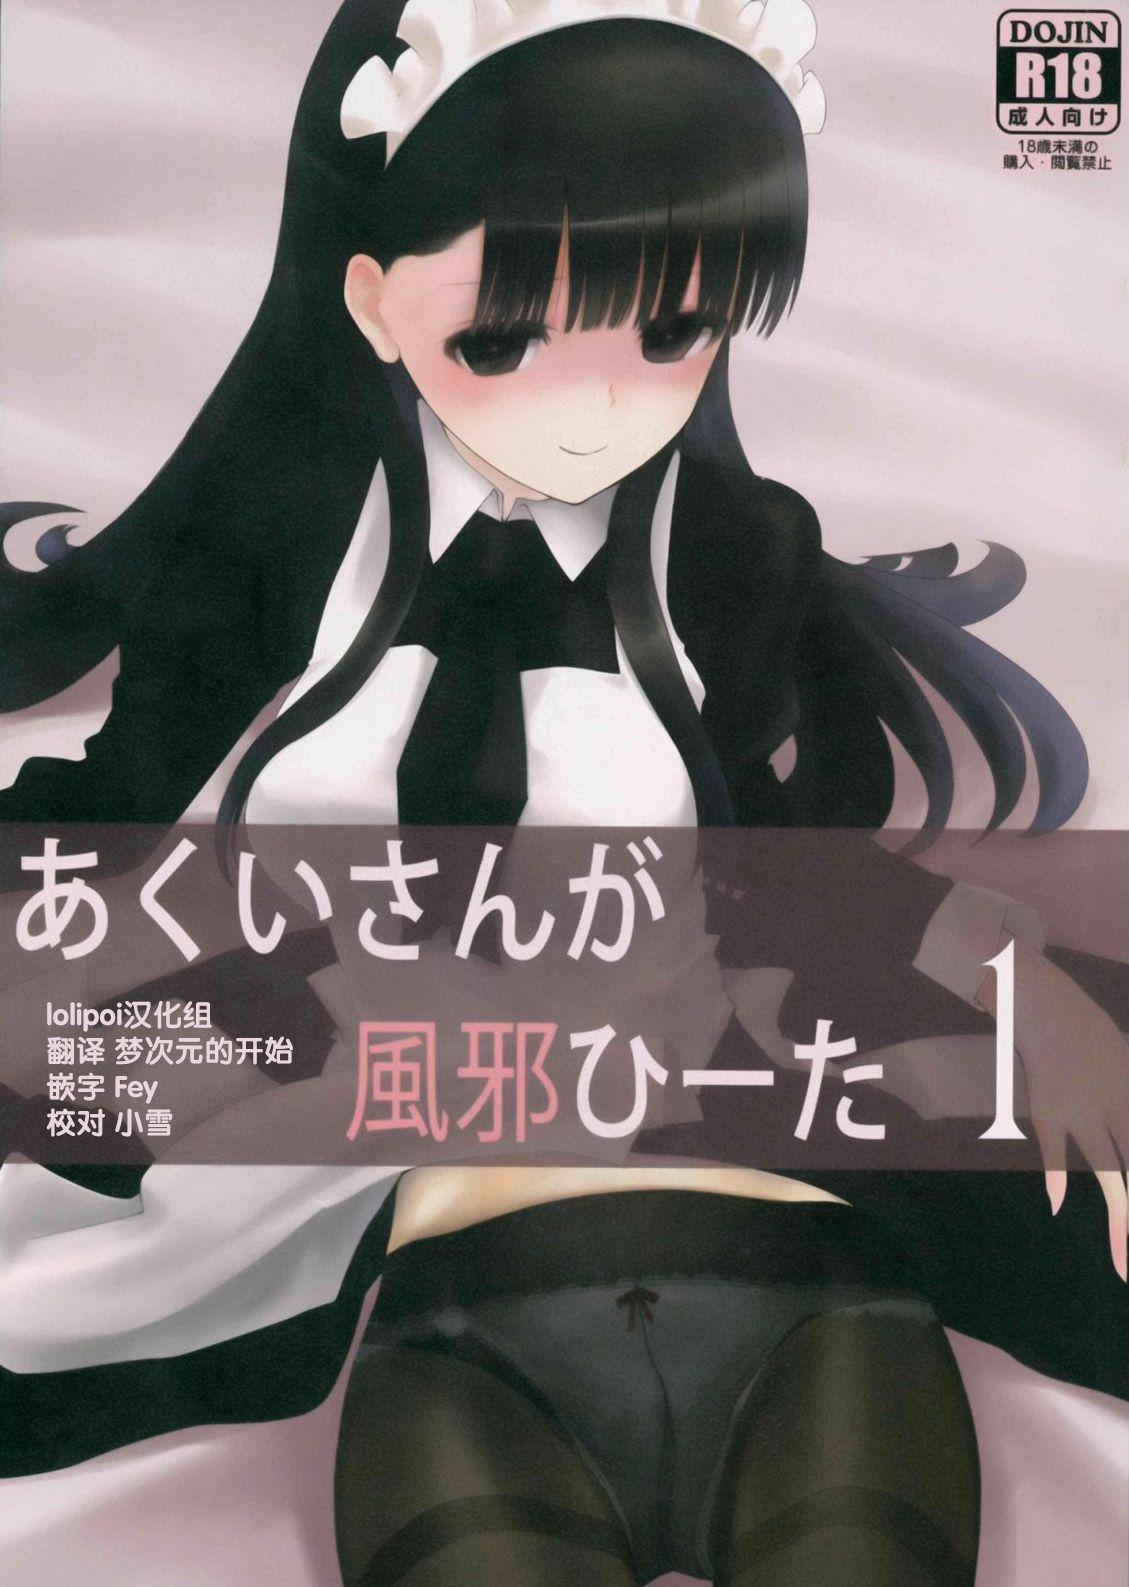 [Heikoushihenkei (Kawanakajima)] Akui-san ga Kaze hi-ta 1 | 阿九井小姐得了感冒1 [Chinese] [lolipoi汉化组] [2014-06-10] 0